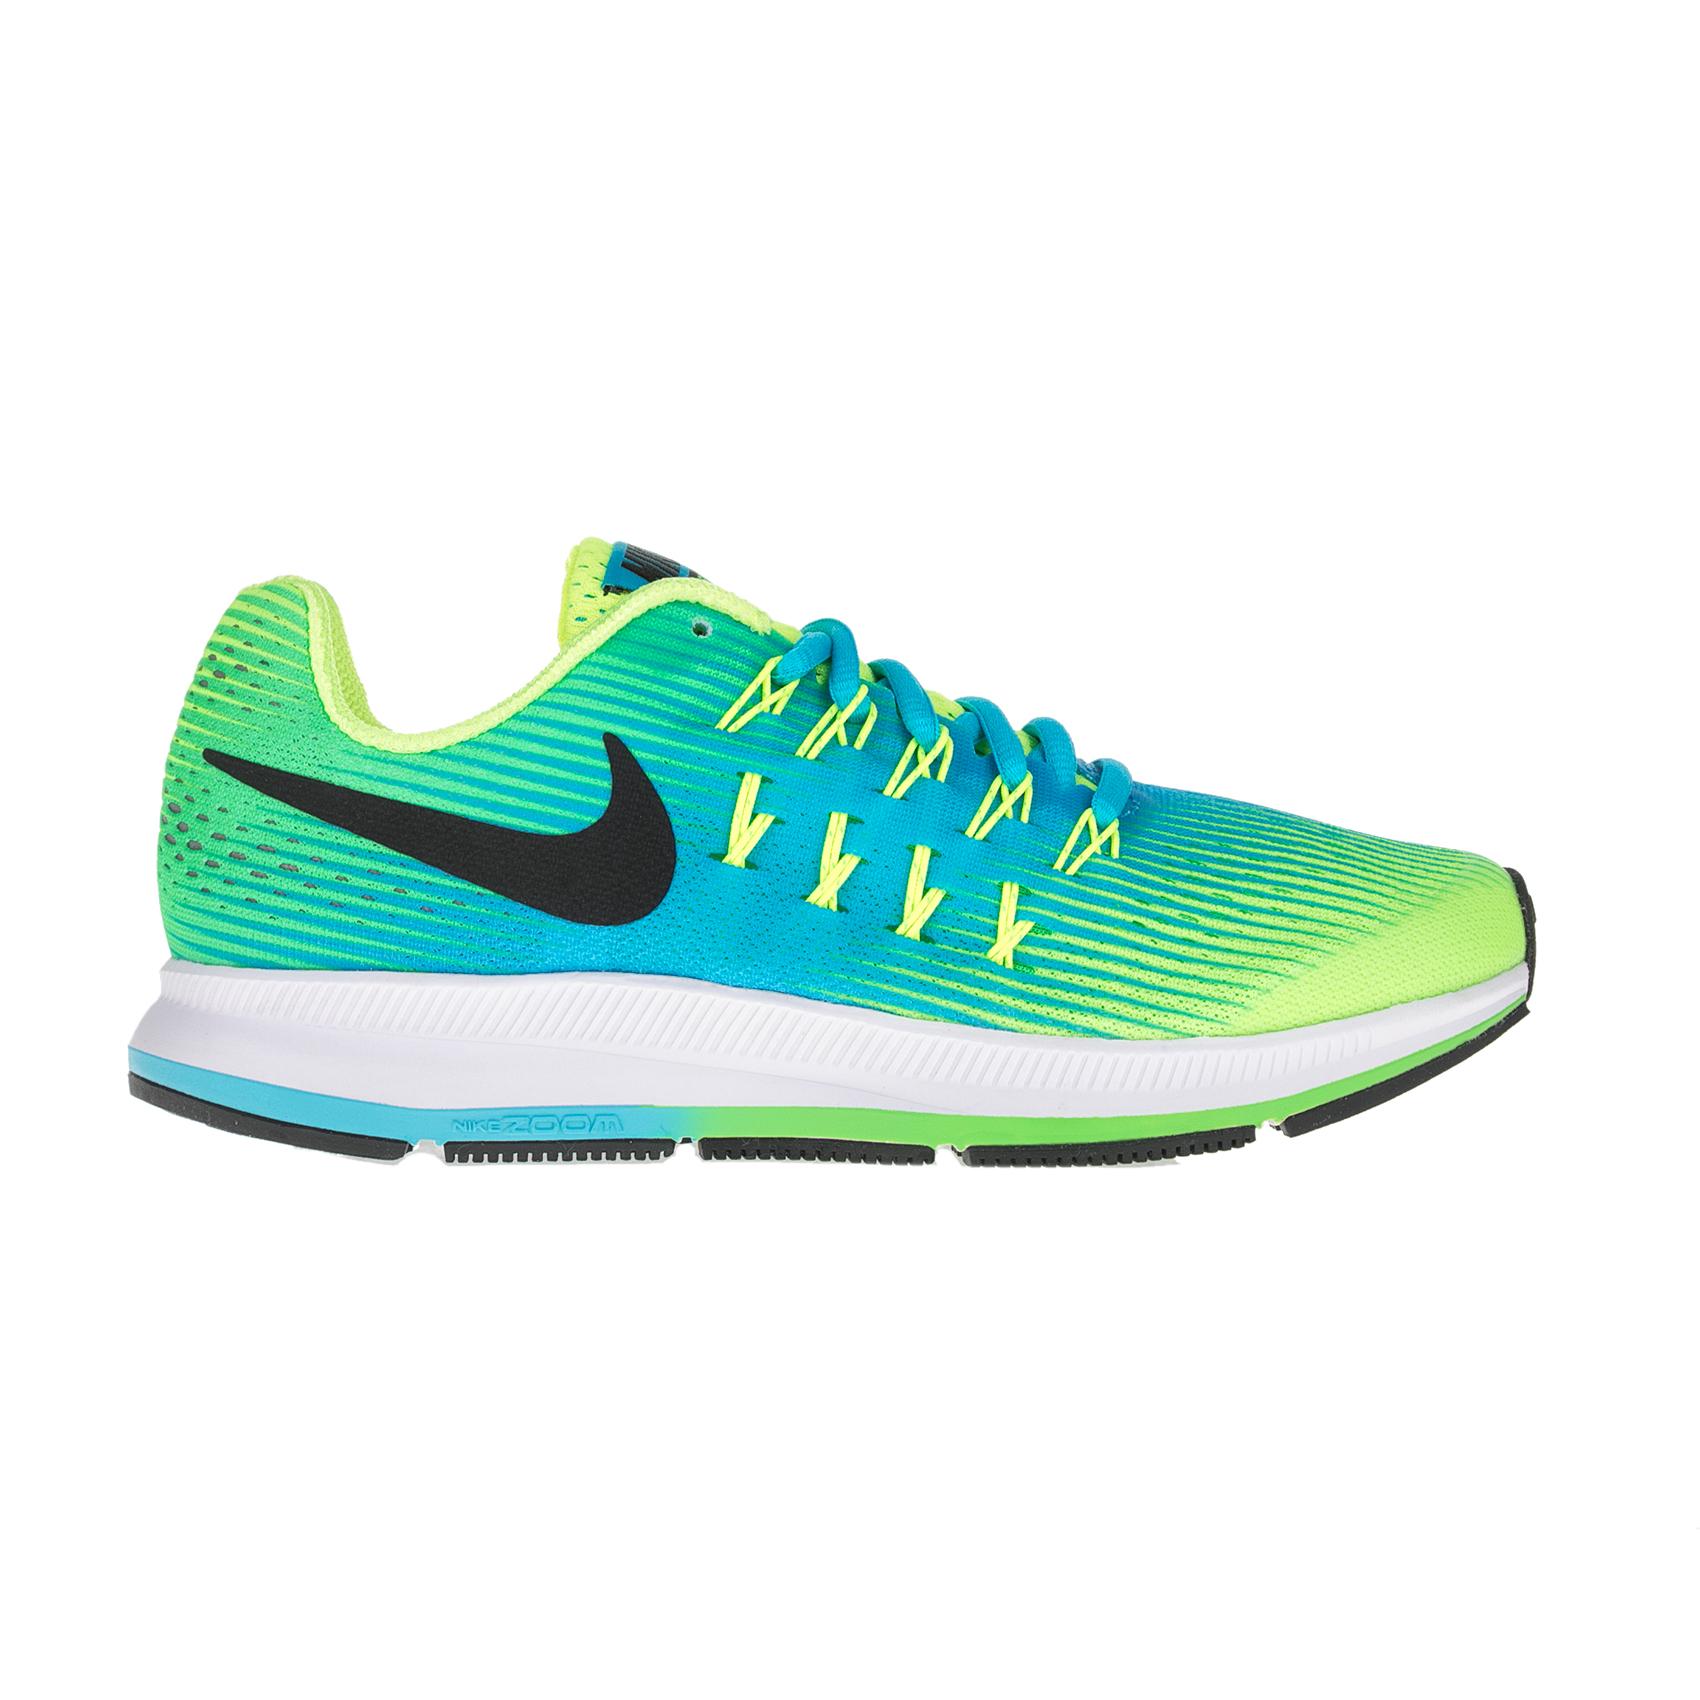 NIKE - Παιδικά αθλητικά παπούτσια NIKE ZOOM PEGASUS 33 (GS) πράσινα - κίτρινα